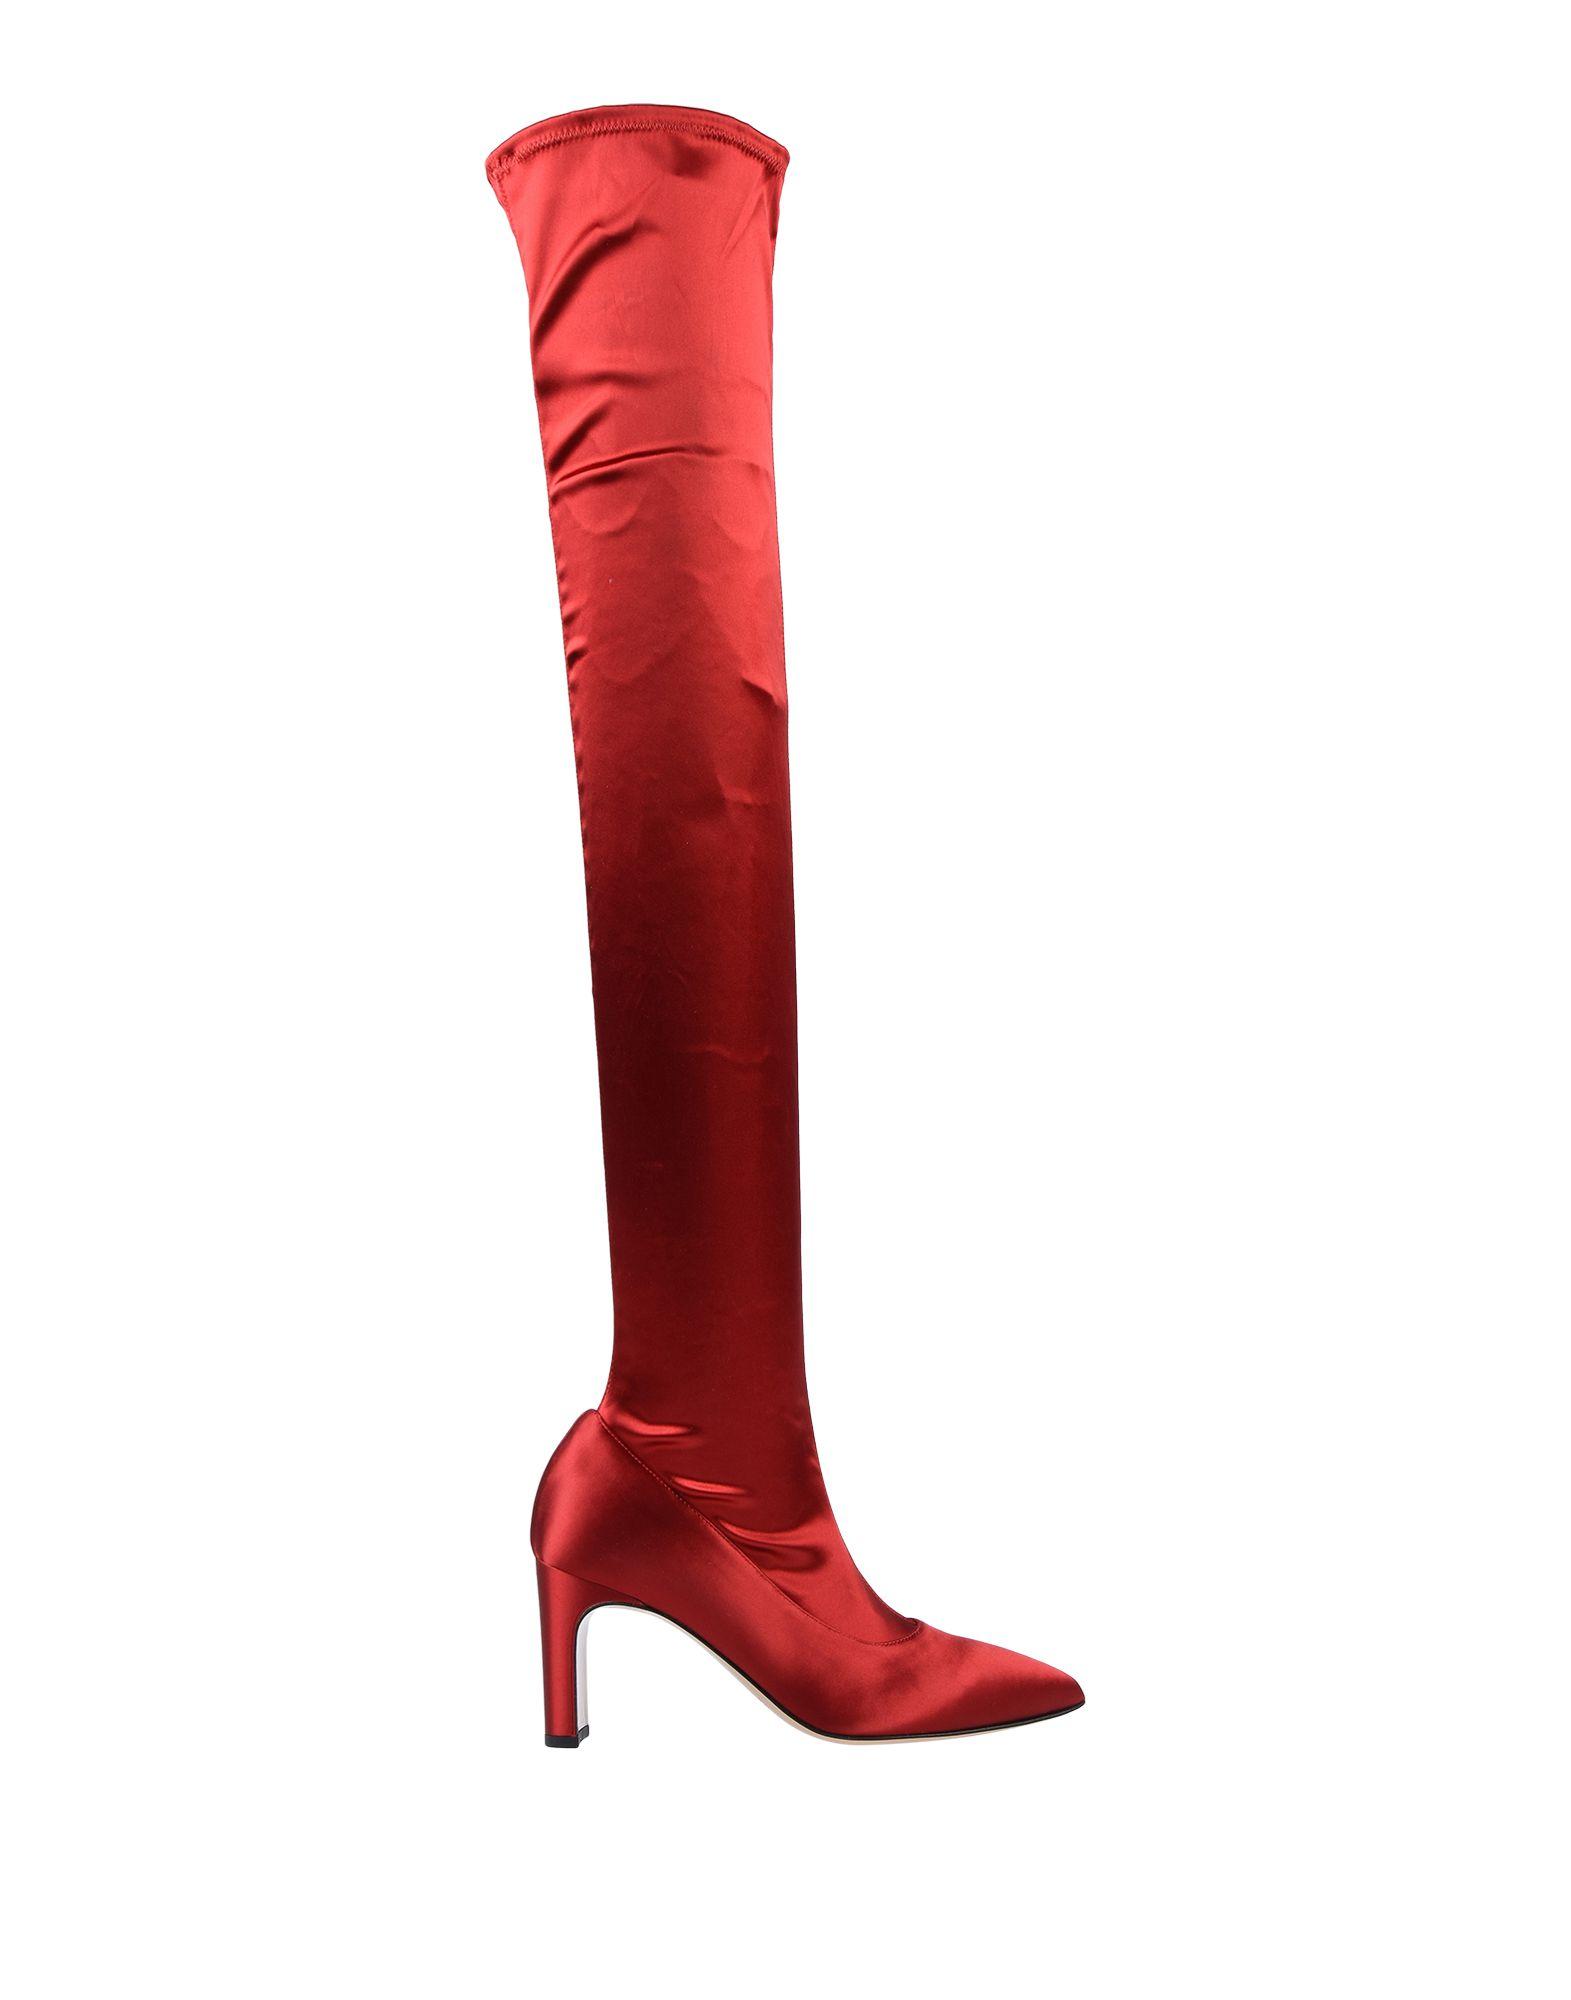 Stiefel Space Style Concept damen - 11670109EN